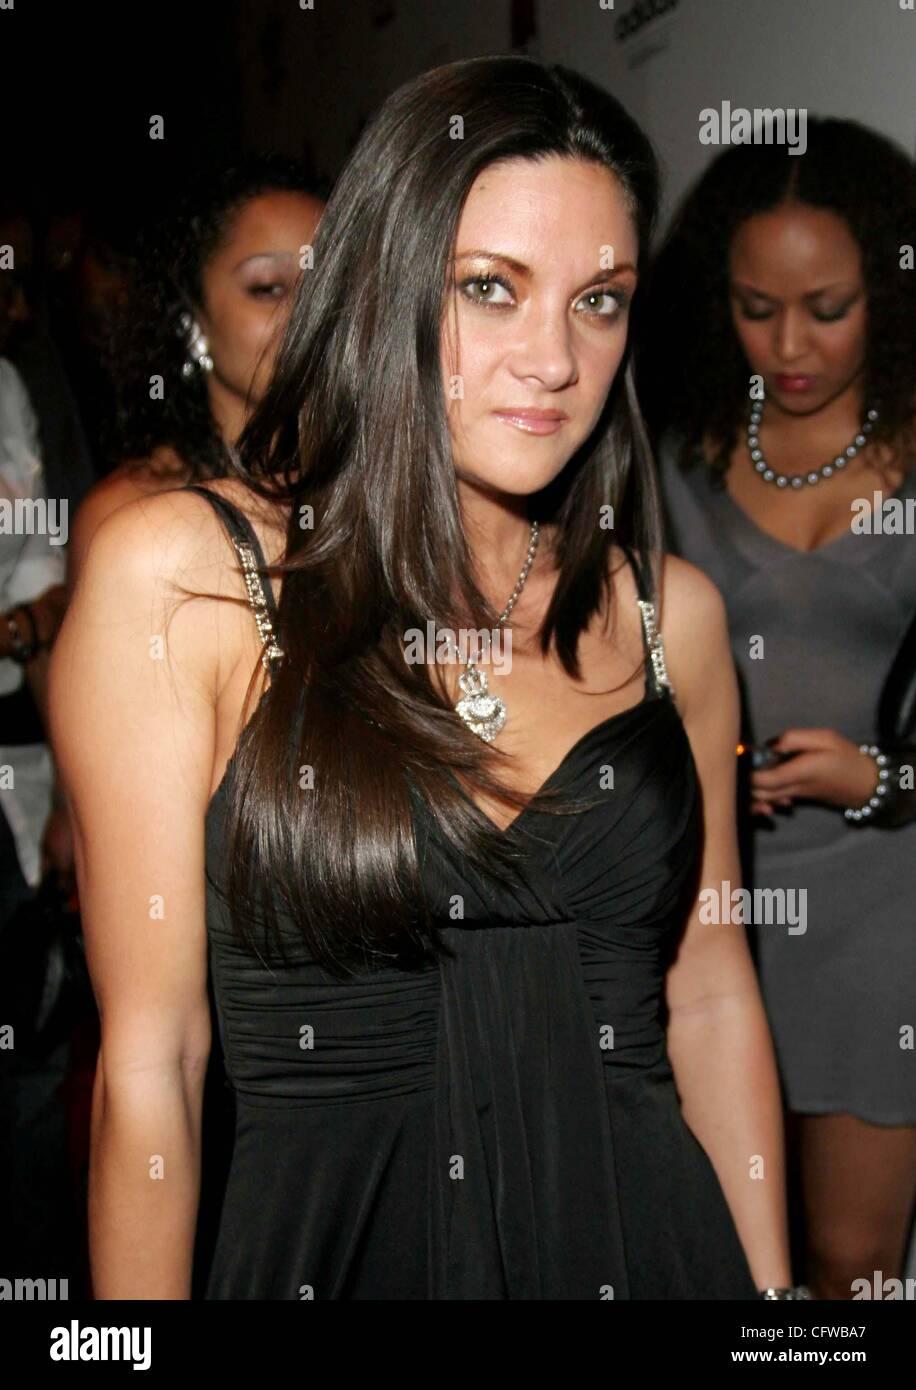 Brooke Hogan born May 5, 1988 (age 30) forecast